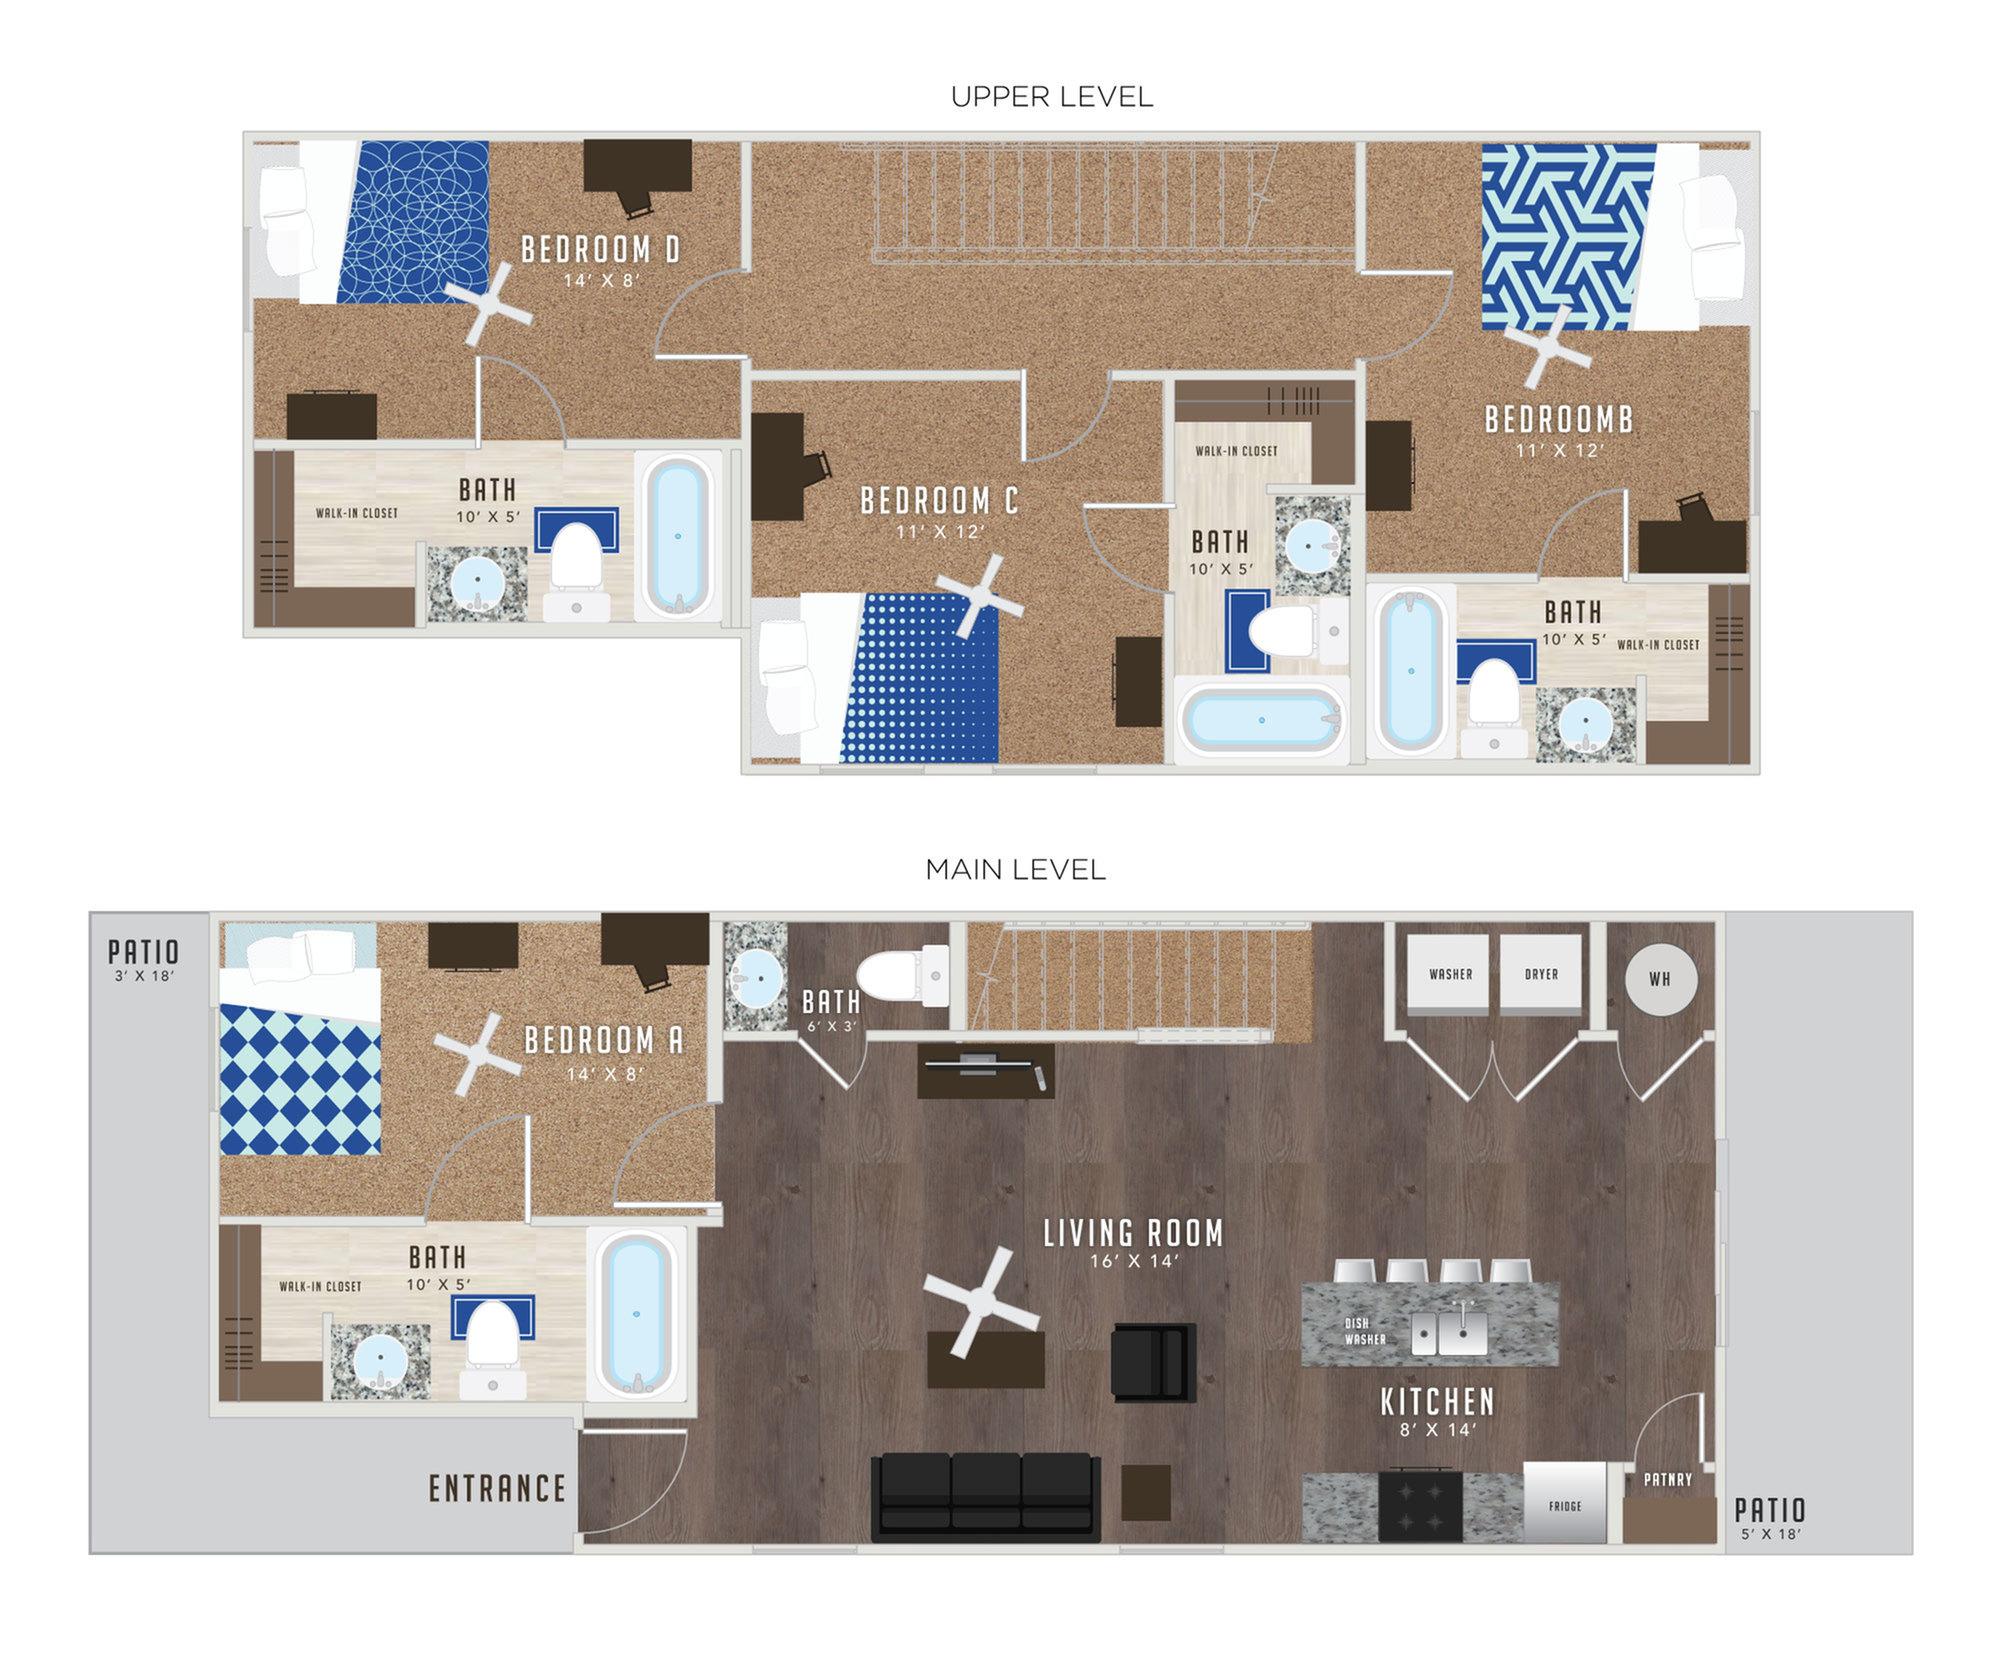 4 Bedroom Floor Plan | KU Off Campus Housing | Lawrence